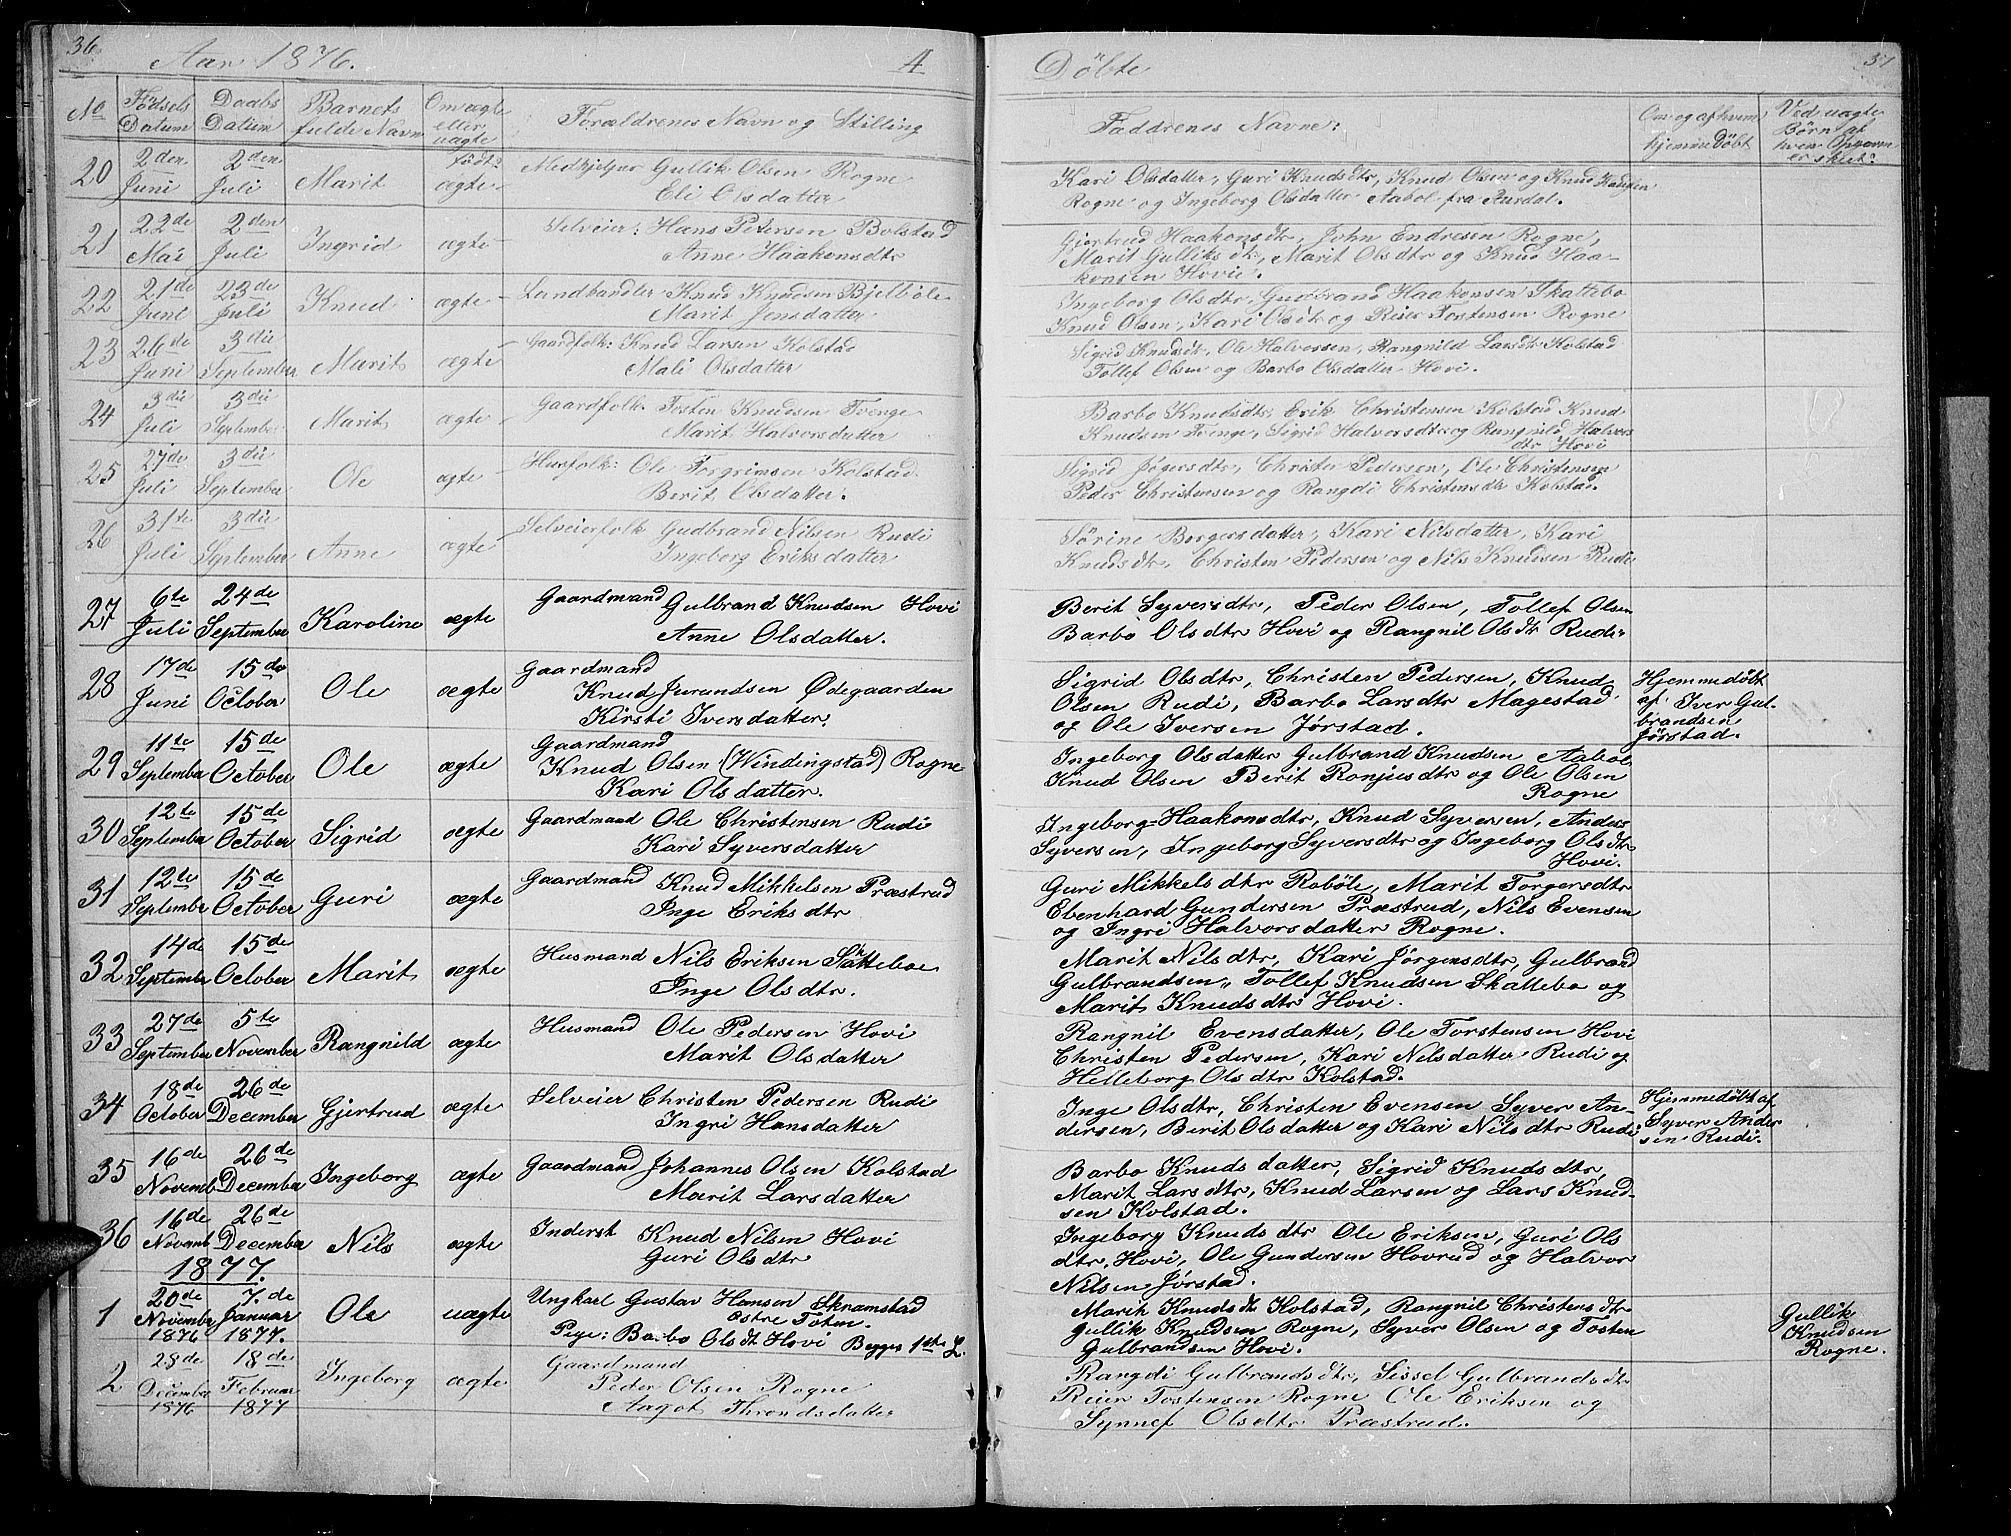 SAH, Øystre Slidre prestekontor, Klokkerbok nr. 3, 1866-1886, s. 36-37